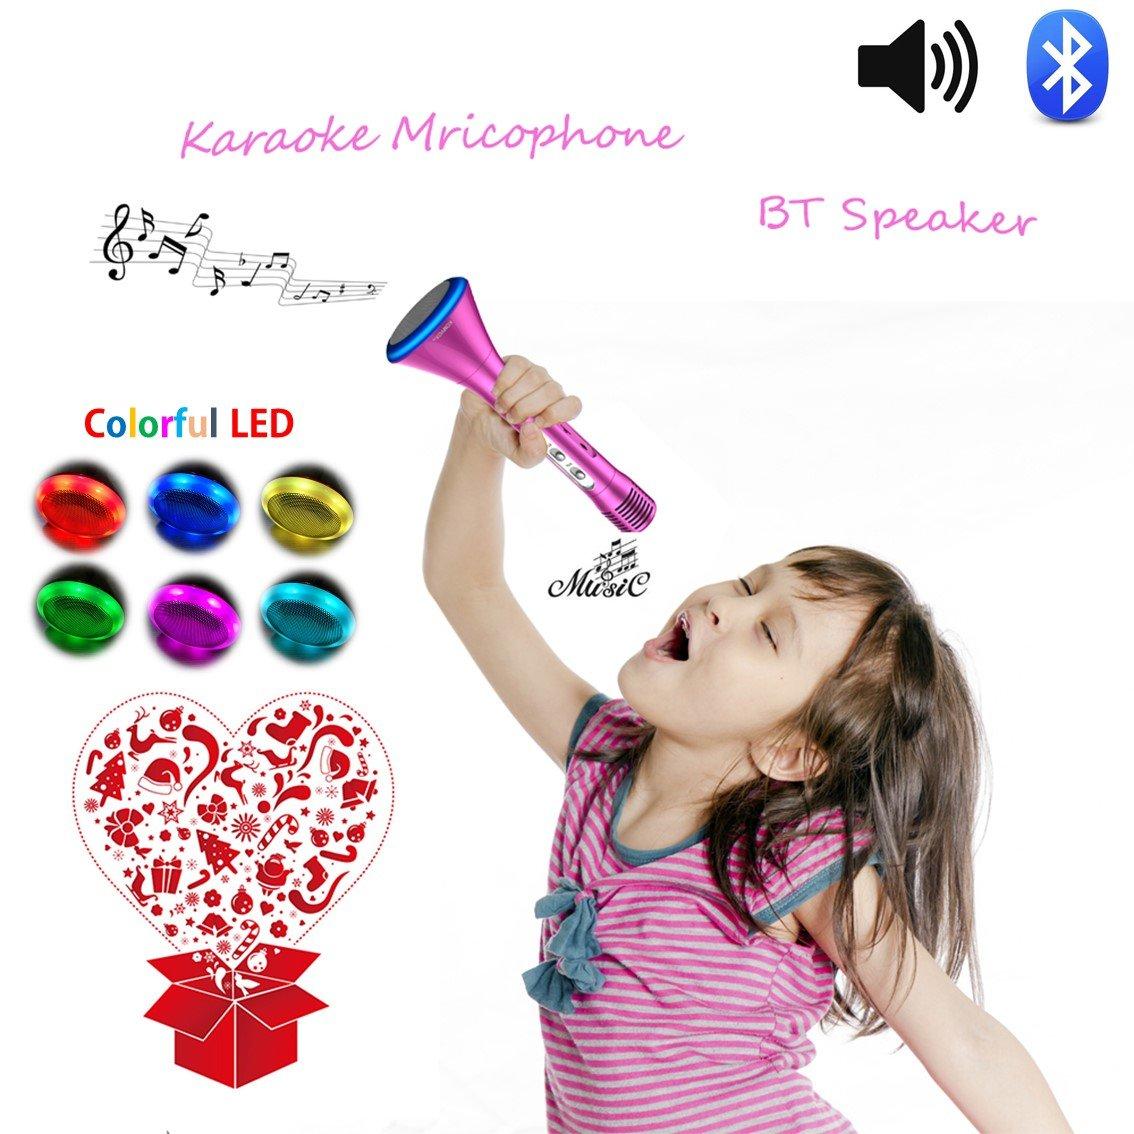 Altavoz Con Microfono Karaoke Para Niños, Chicas Juguetes de Micrófono, Máquina de Canto Infantil Inalámbrica Bluetooth, Equipo de Canto de Fiesta Al Aire Libre Con Diseño de Princesa, Juegos de Baile de Familia Cantando Regalos, Juguetes Electrónicos Cre